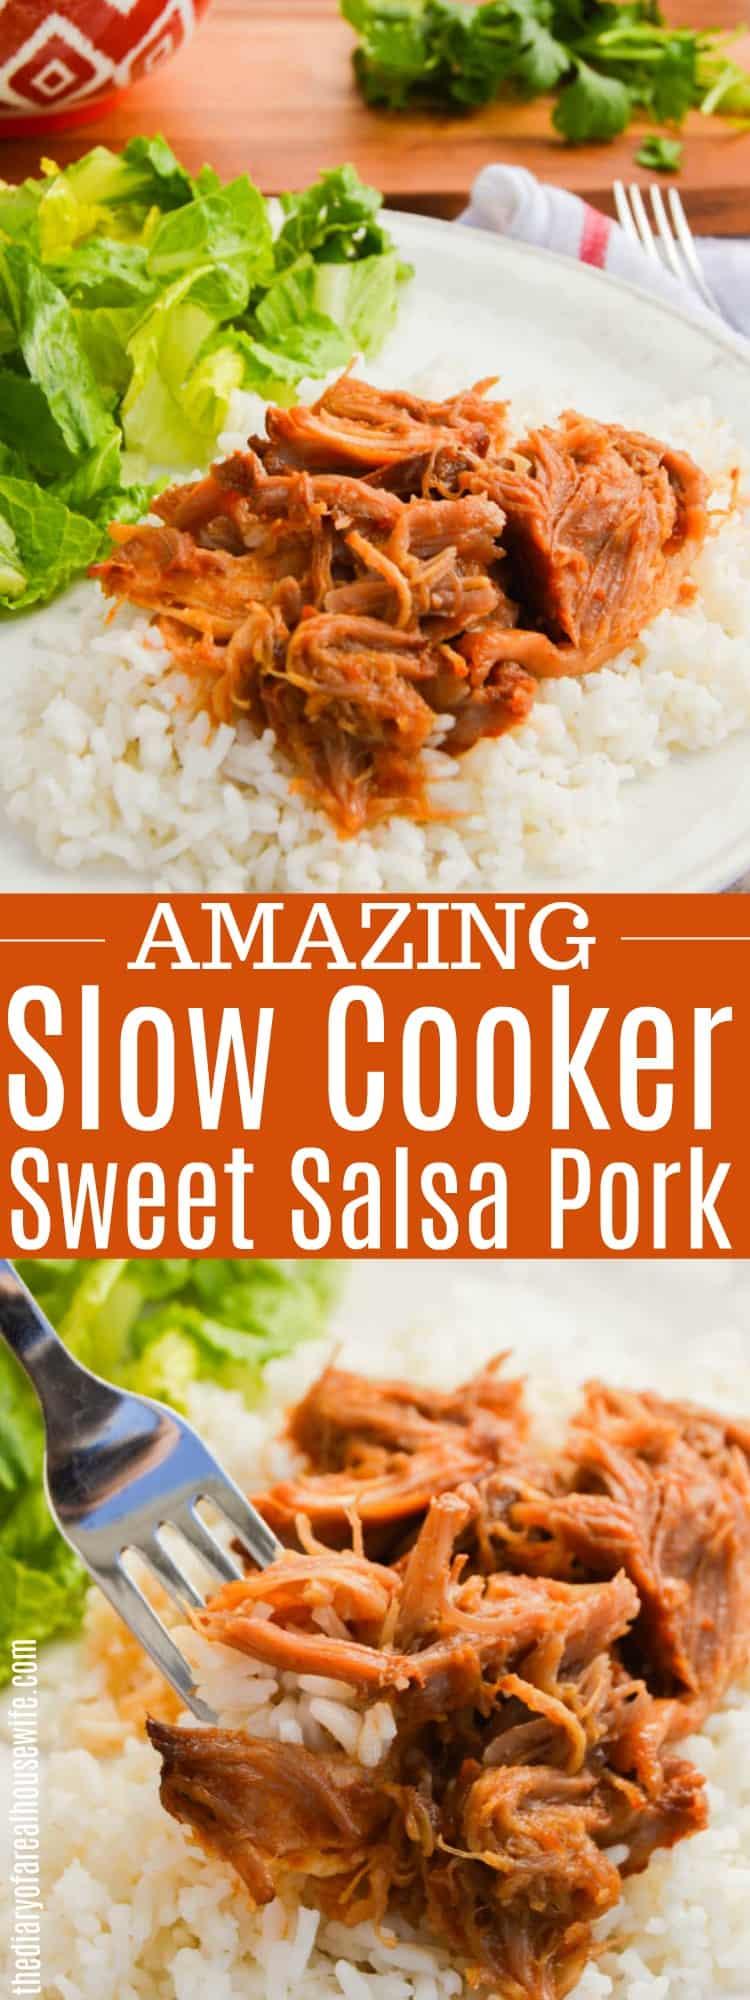 Slow Cooker Sweet Salsa Pork!